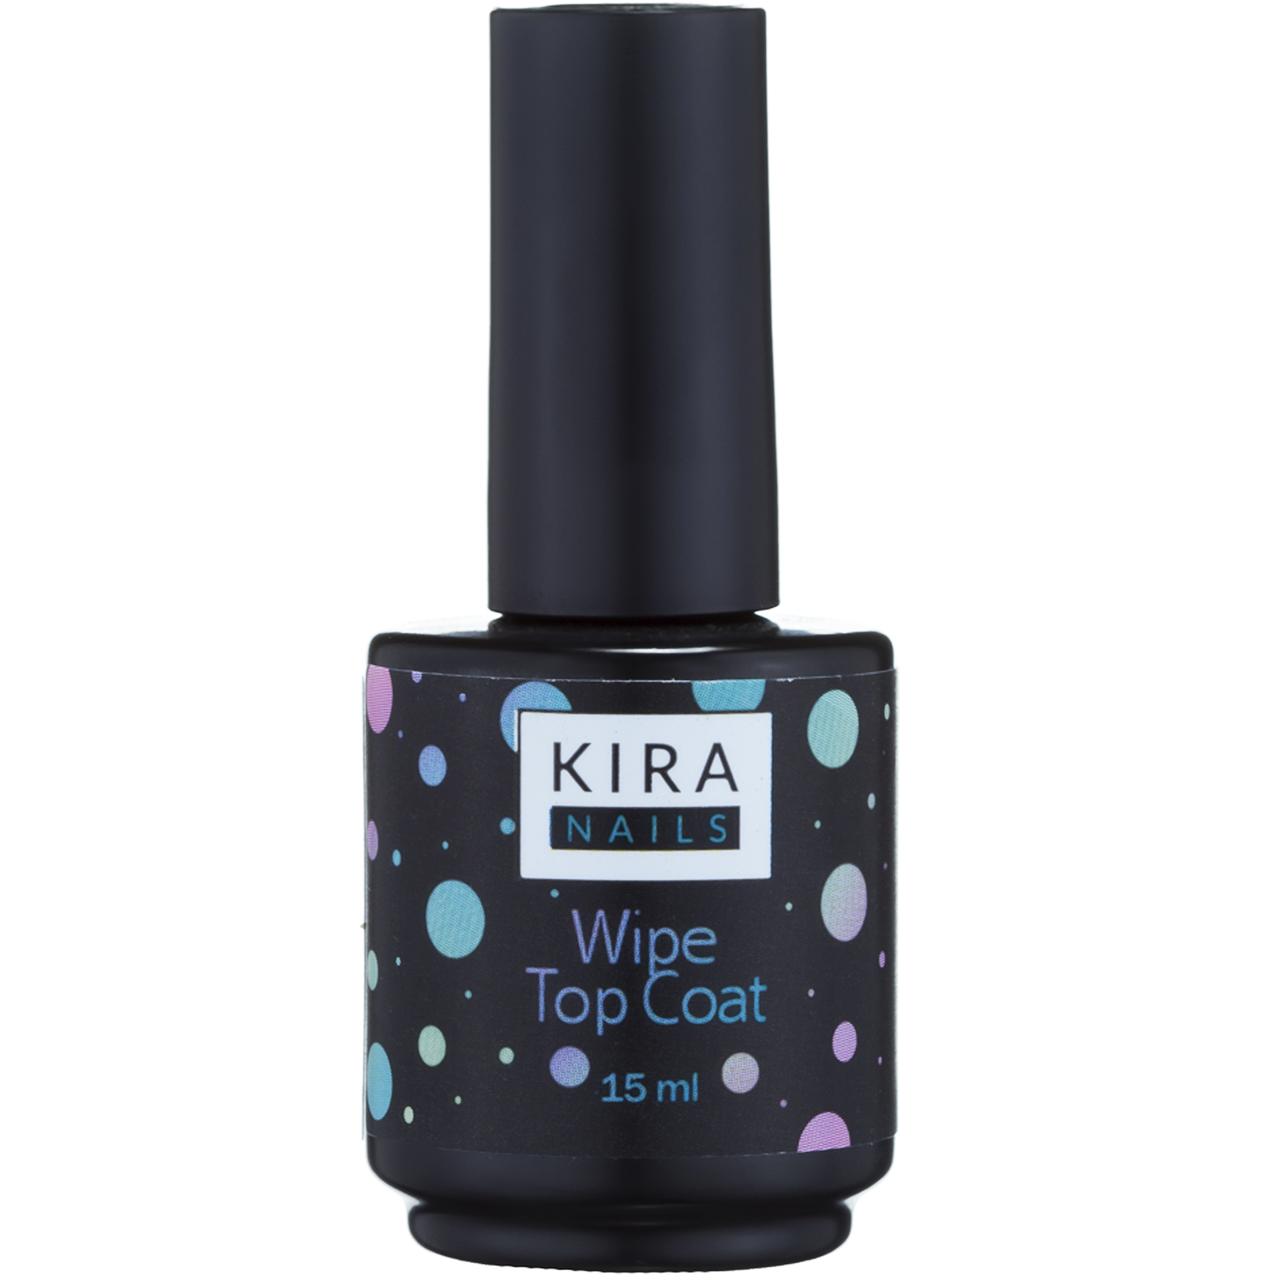 Топ гель для лаку Kira Nails NO Wipe Top Coat 15 мл без липкого шару